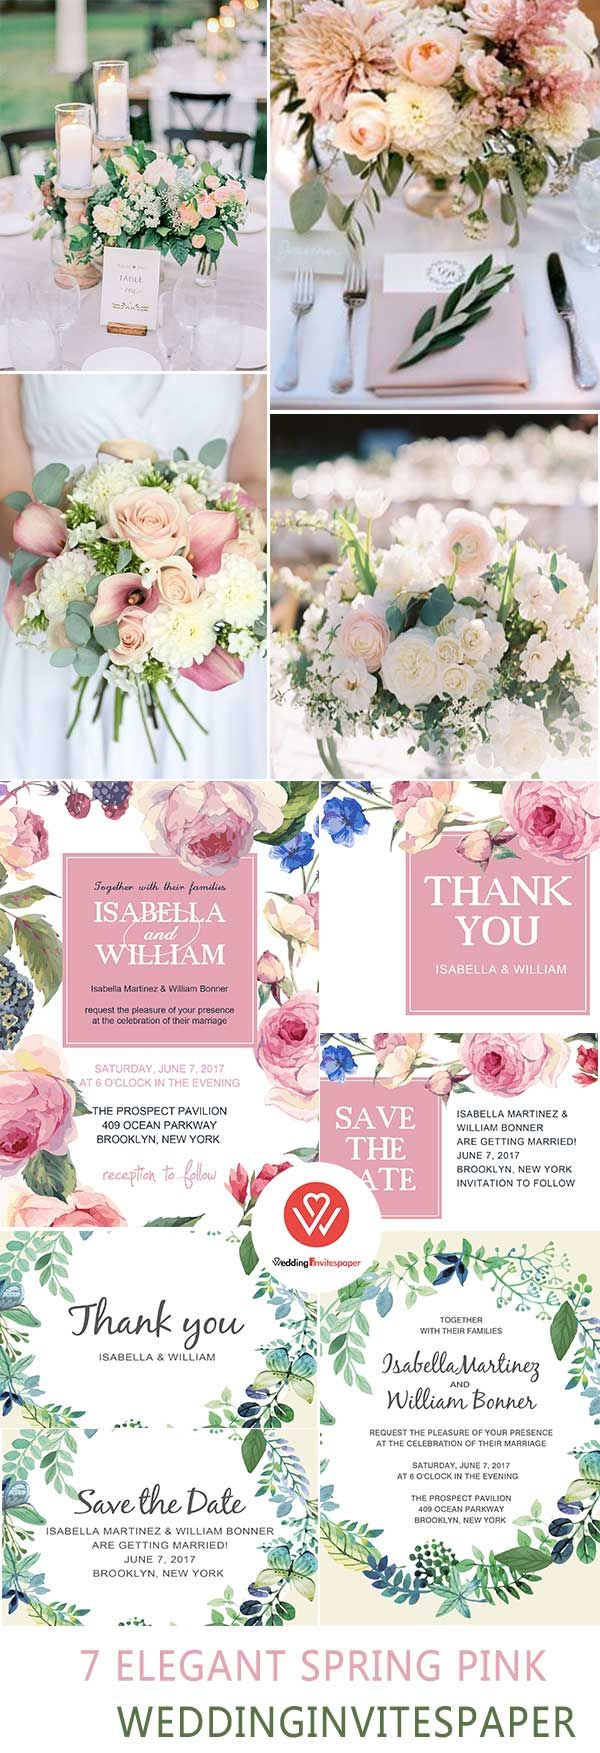 7 super elegant affordable blush pink spring wedding invitations 7 super elegant affordable blush pink spring wedding invitations from wip wedding invites paper izmirmasajfo